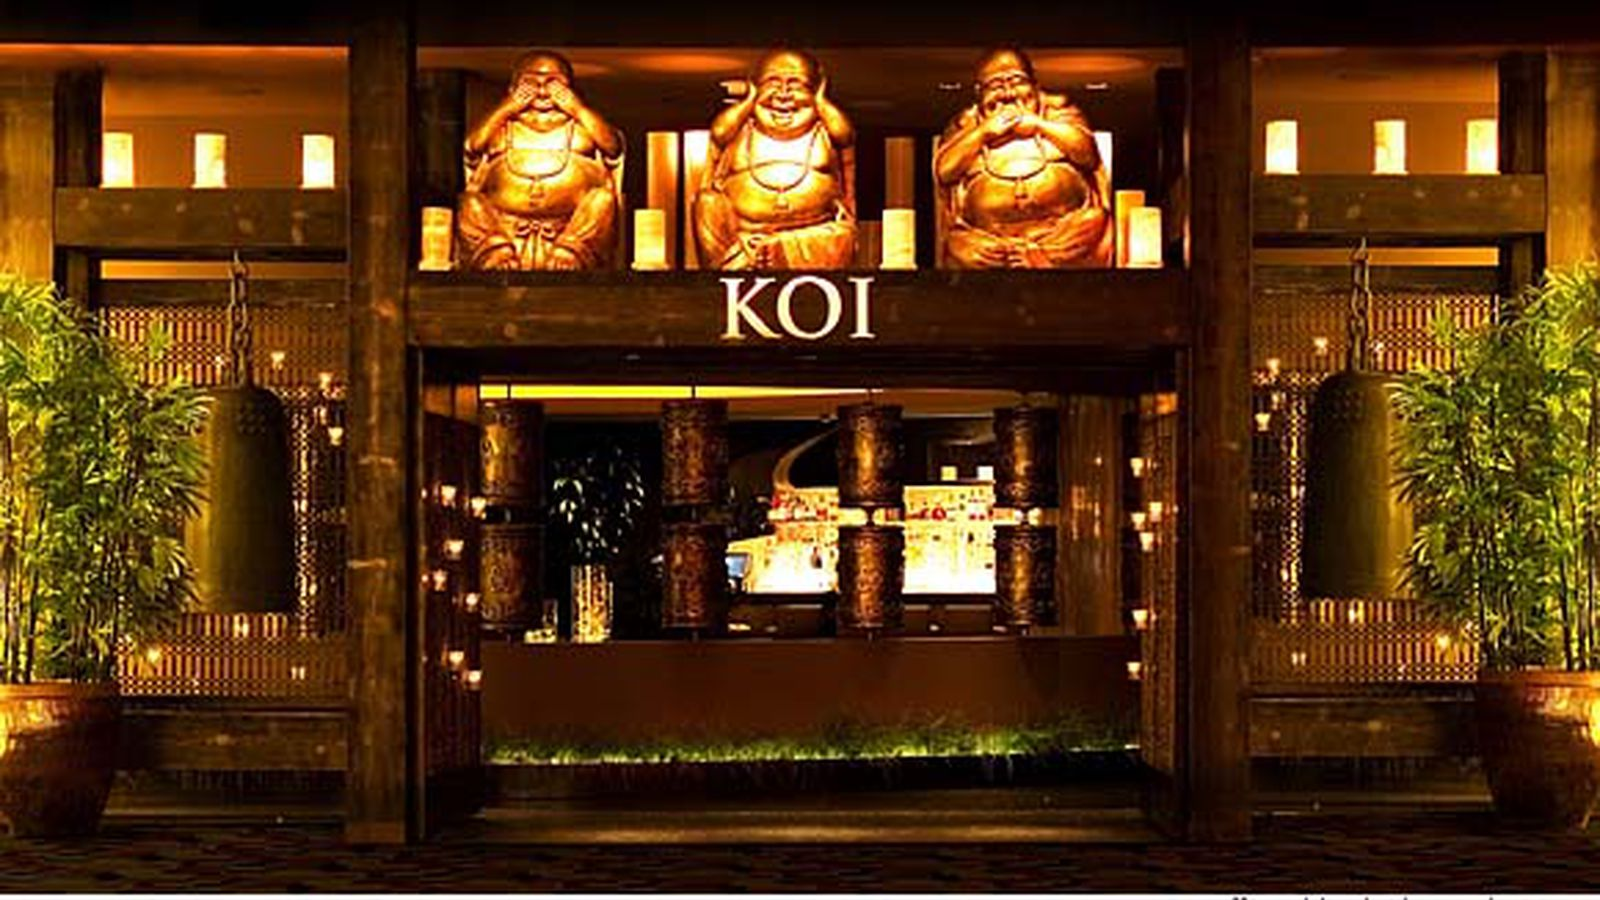 Philippe sells gansevoort space to la sushi hot spot koi for Koi new york